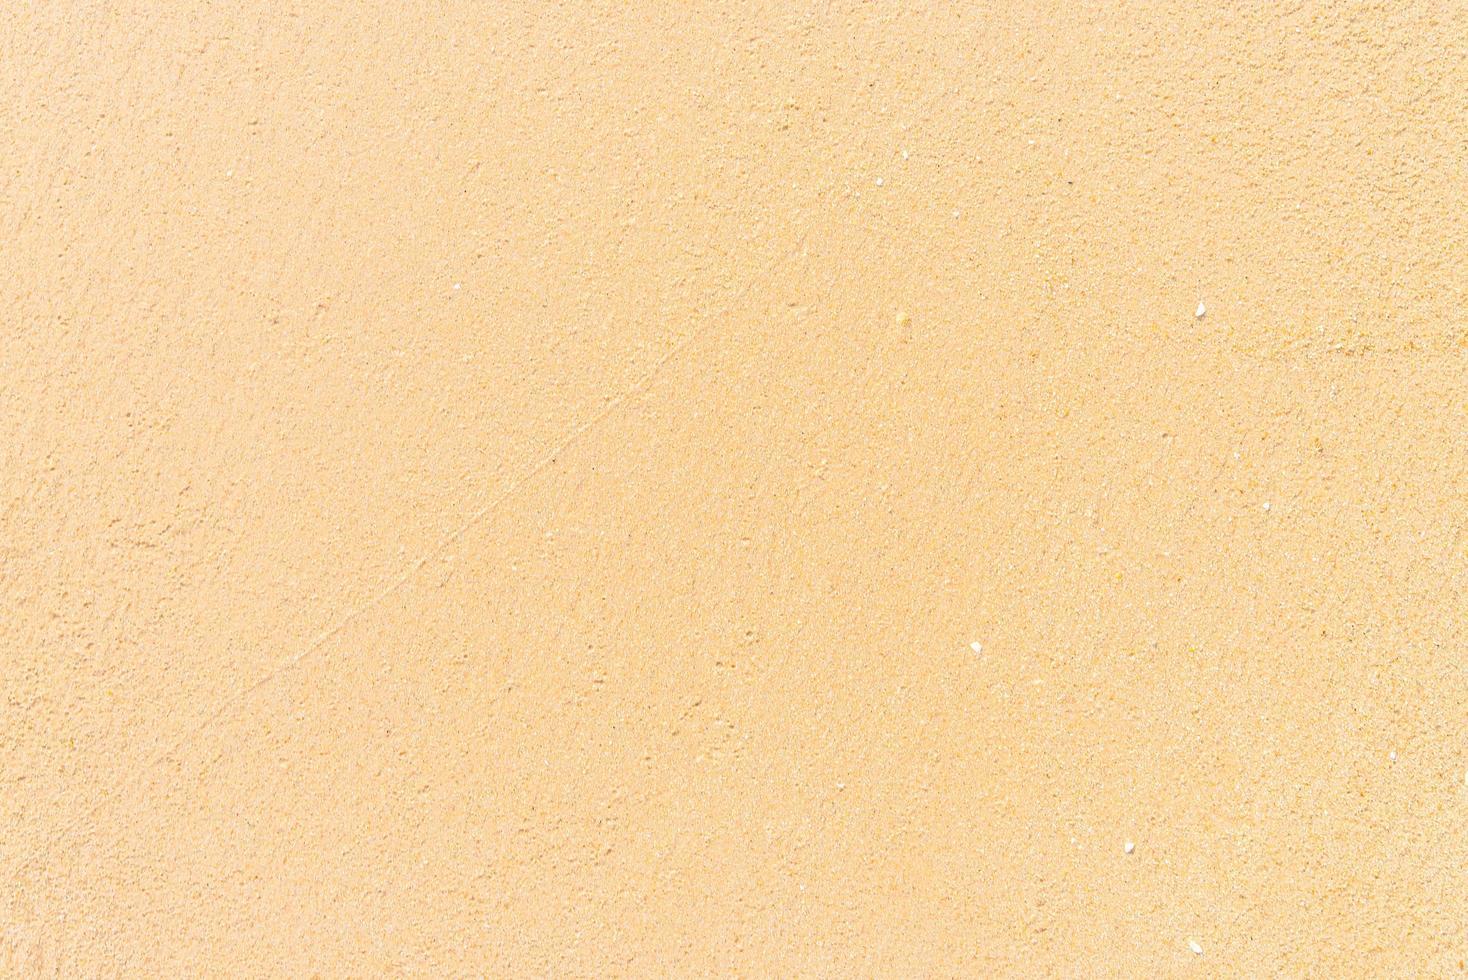 fond de textures de sable photo